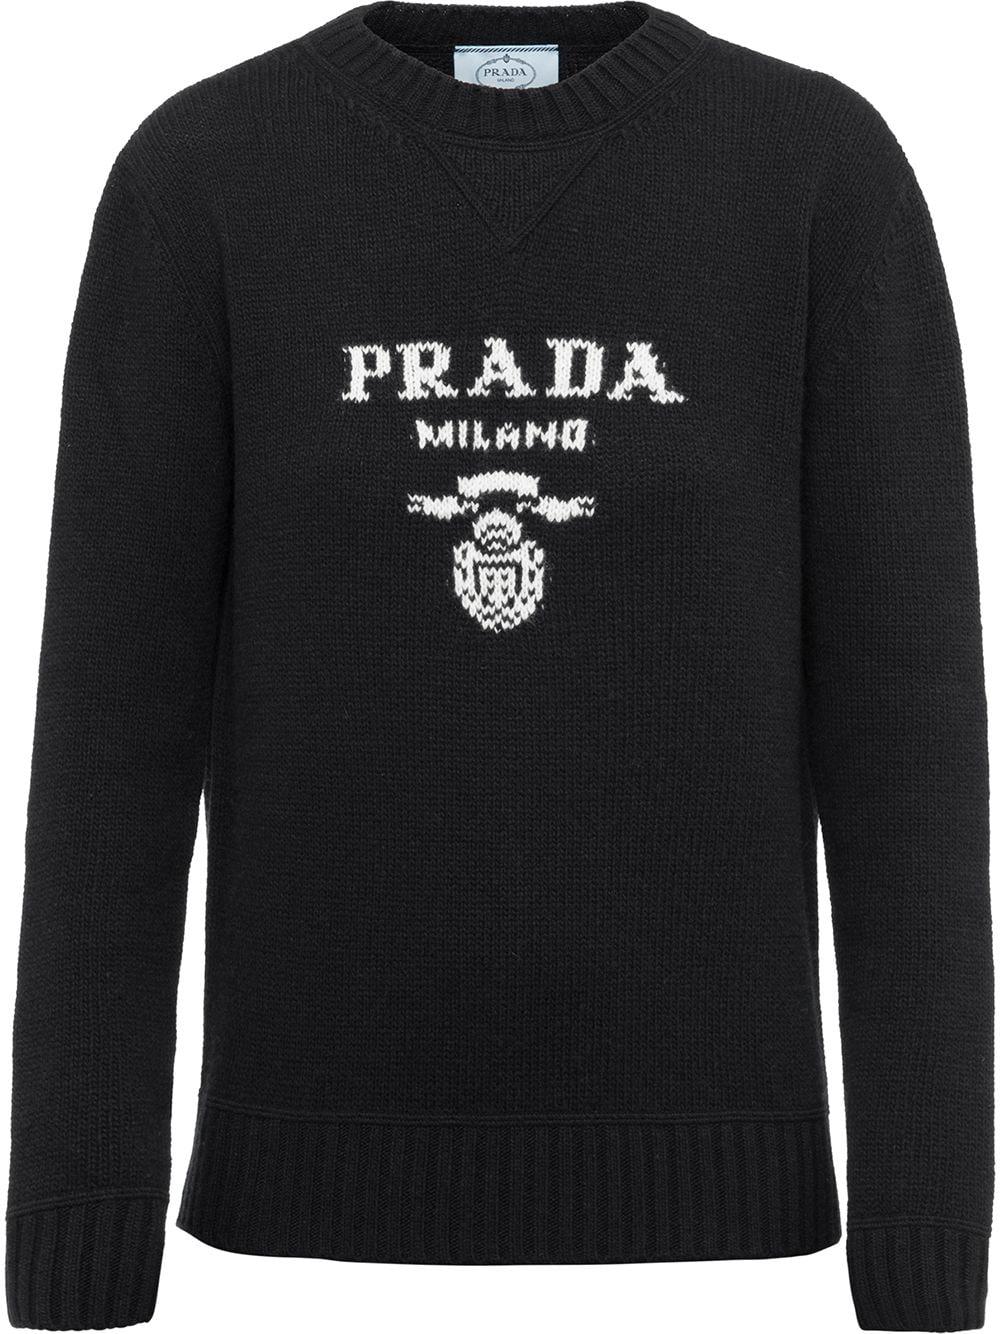 Prada intarsia-knit logo jumper - Schwarz